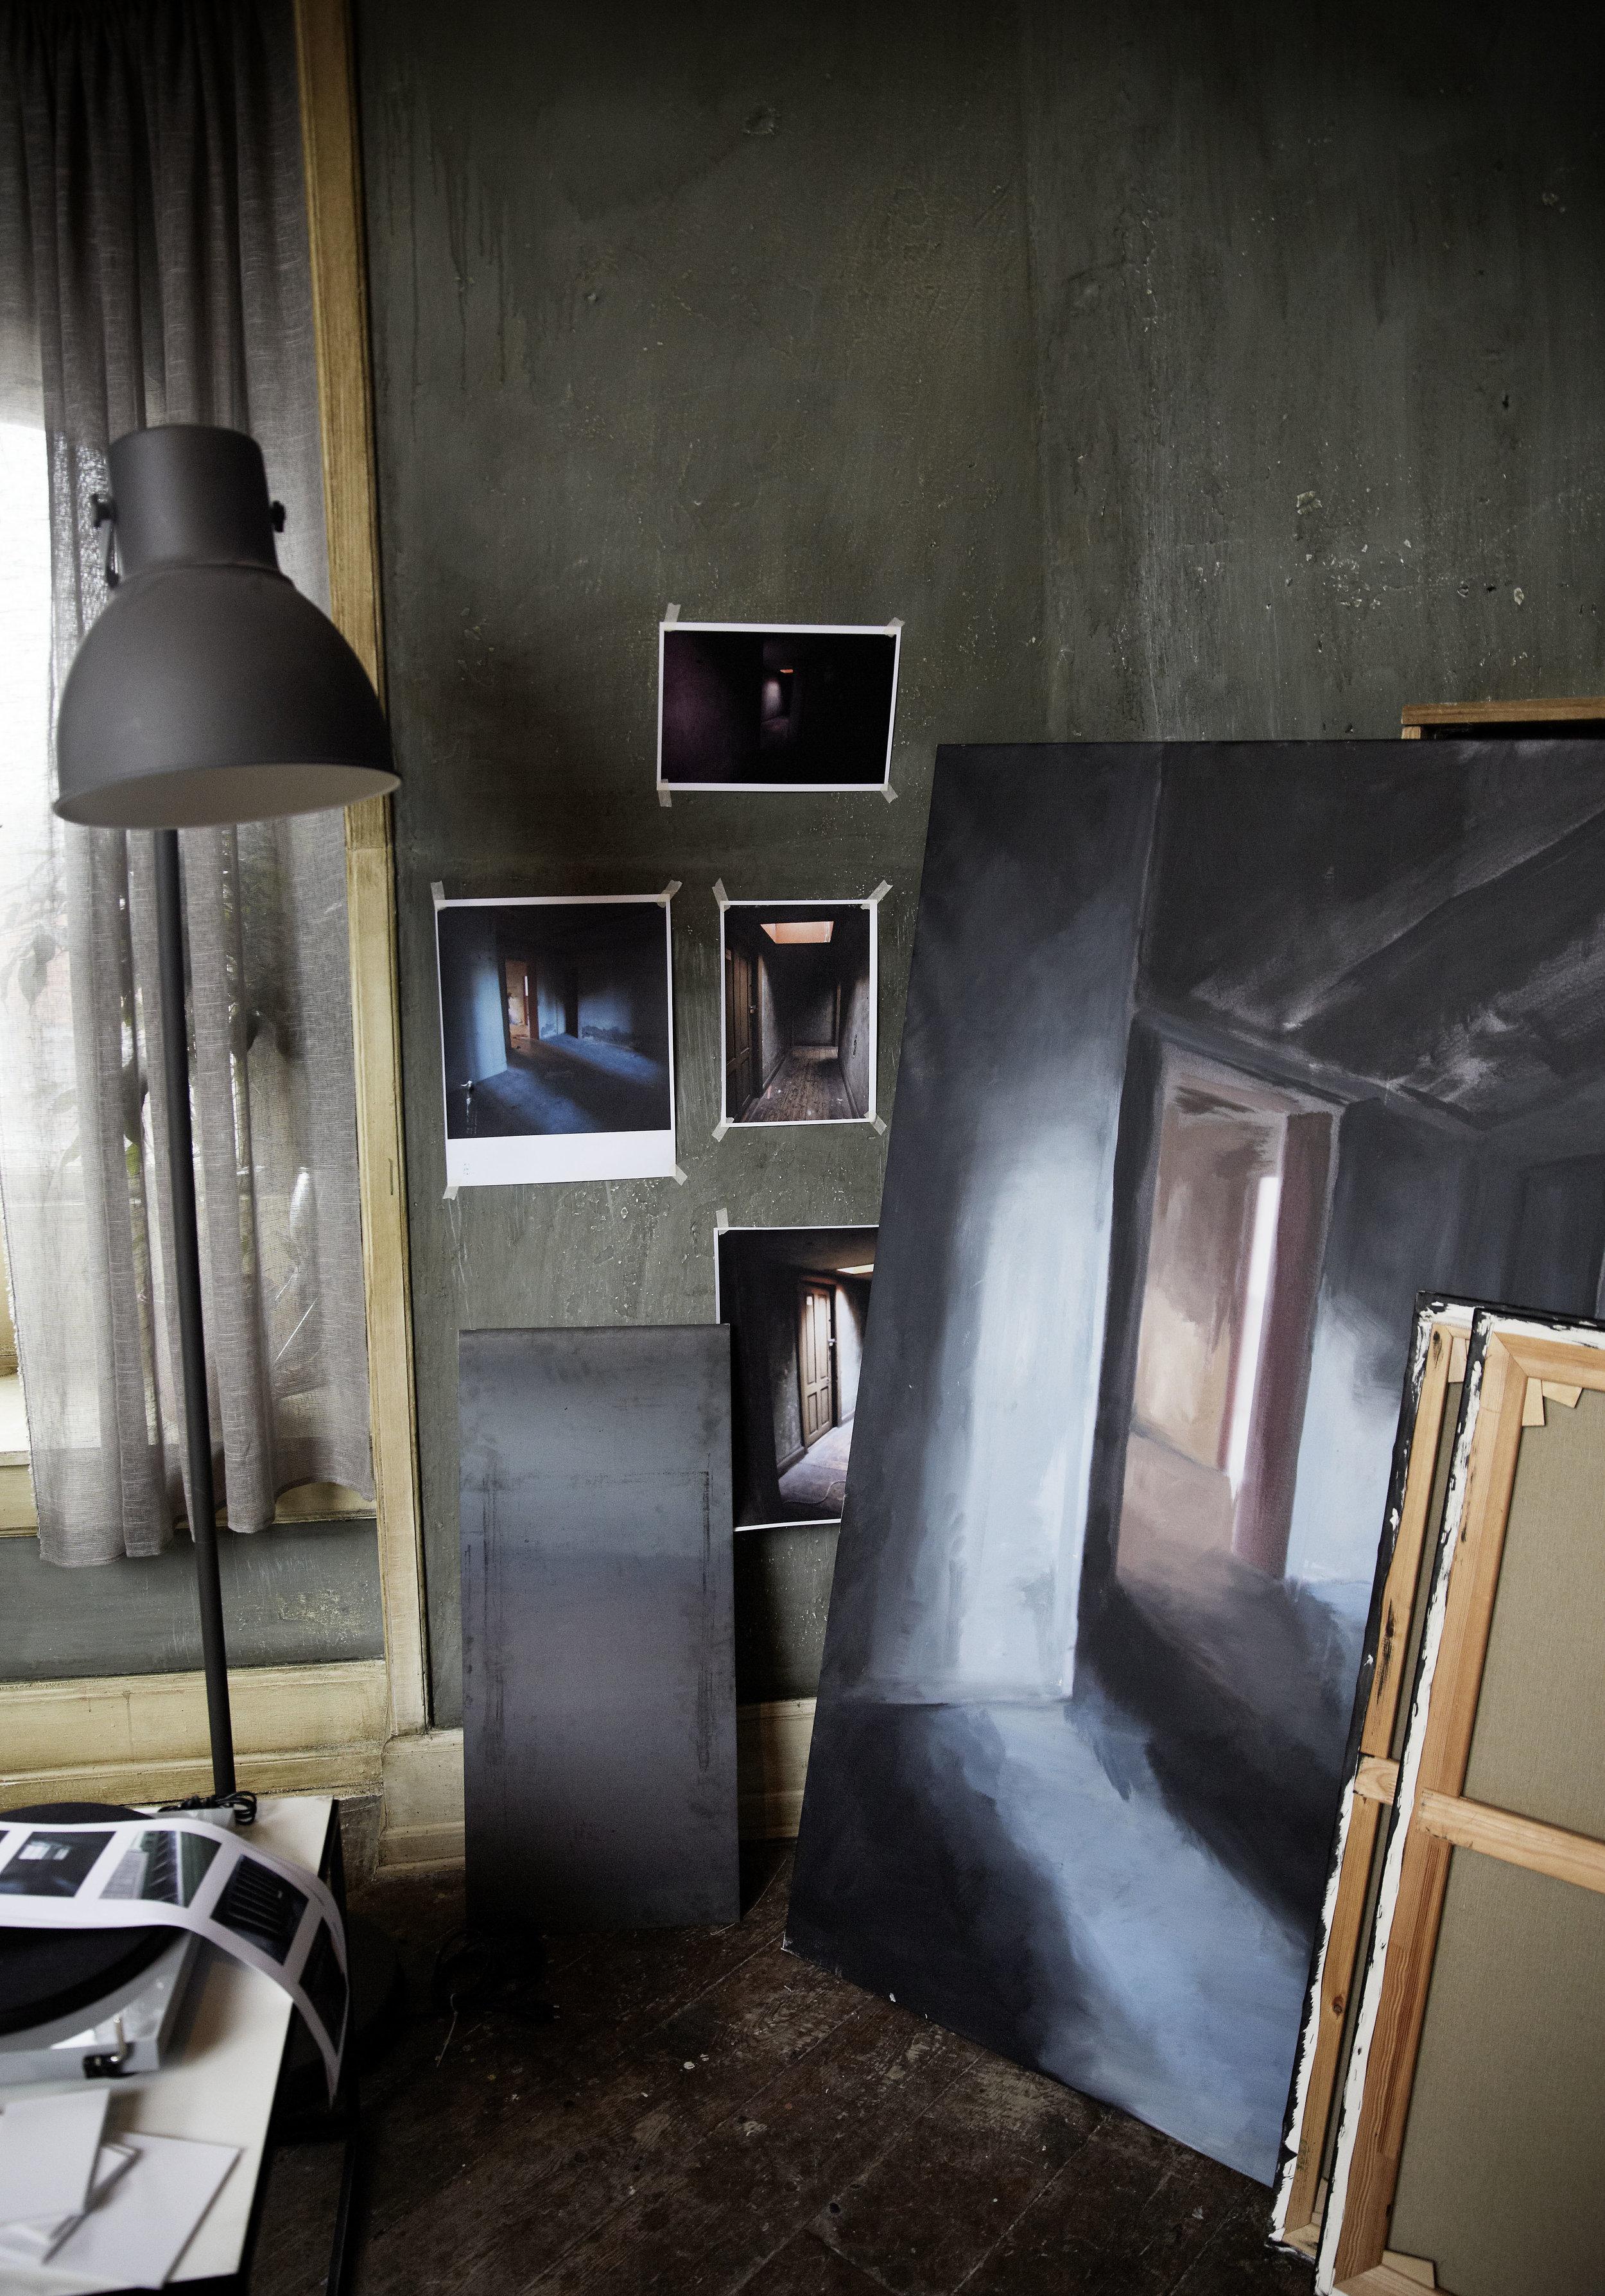 aminas_breve_production_design_knirke_madelung_photo_tine_harden_3.jpg